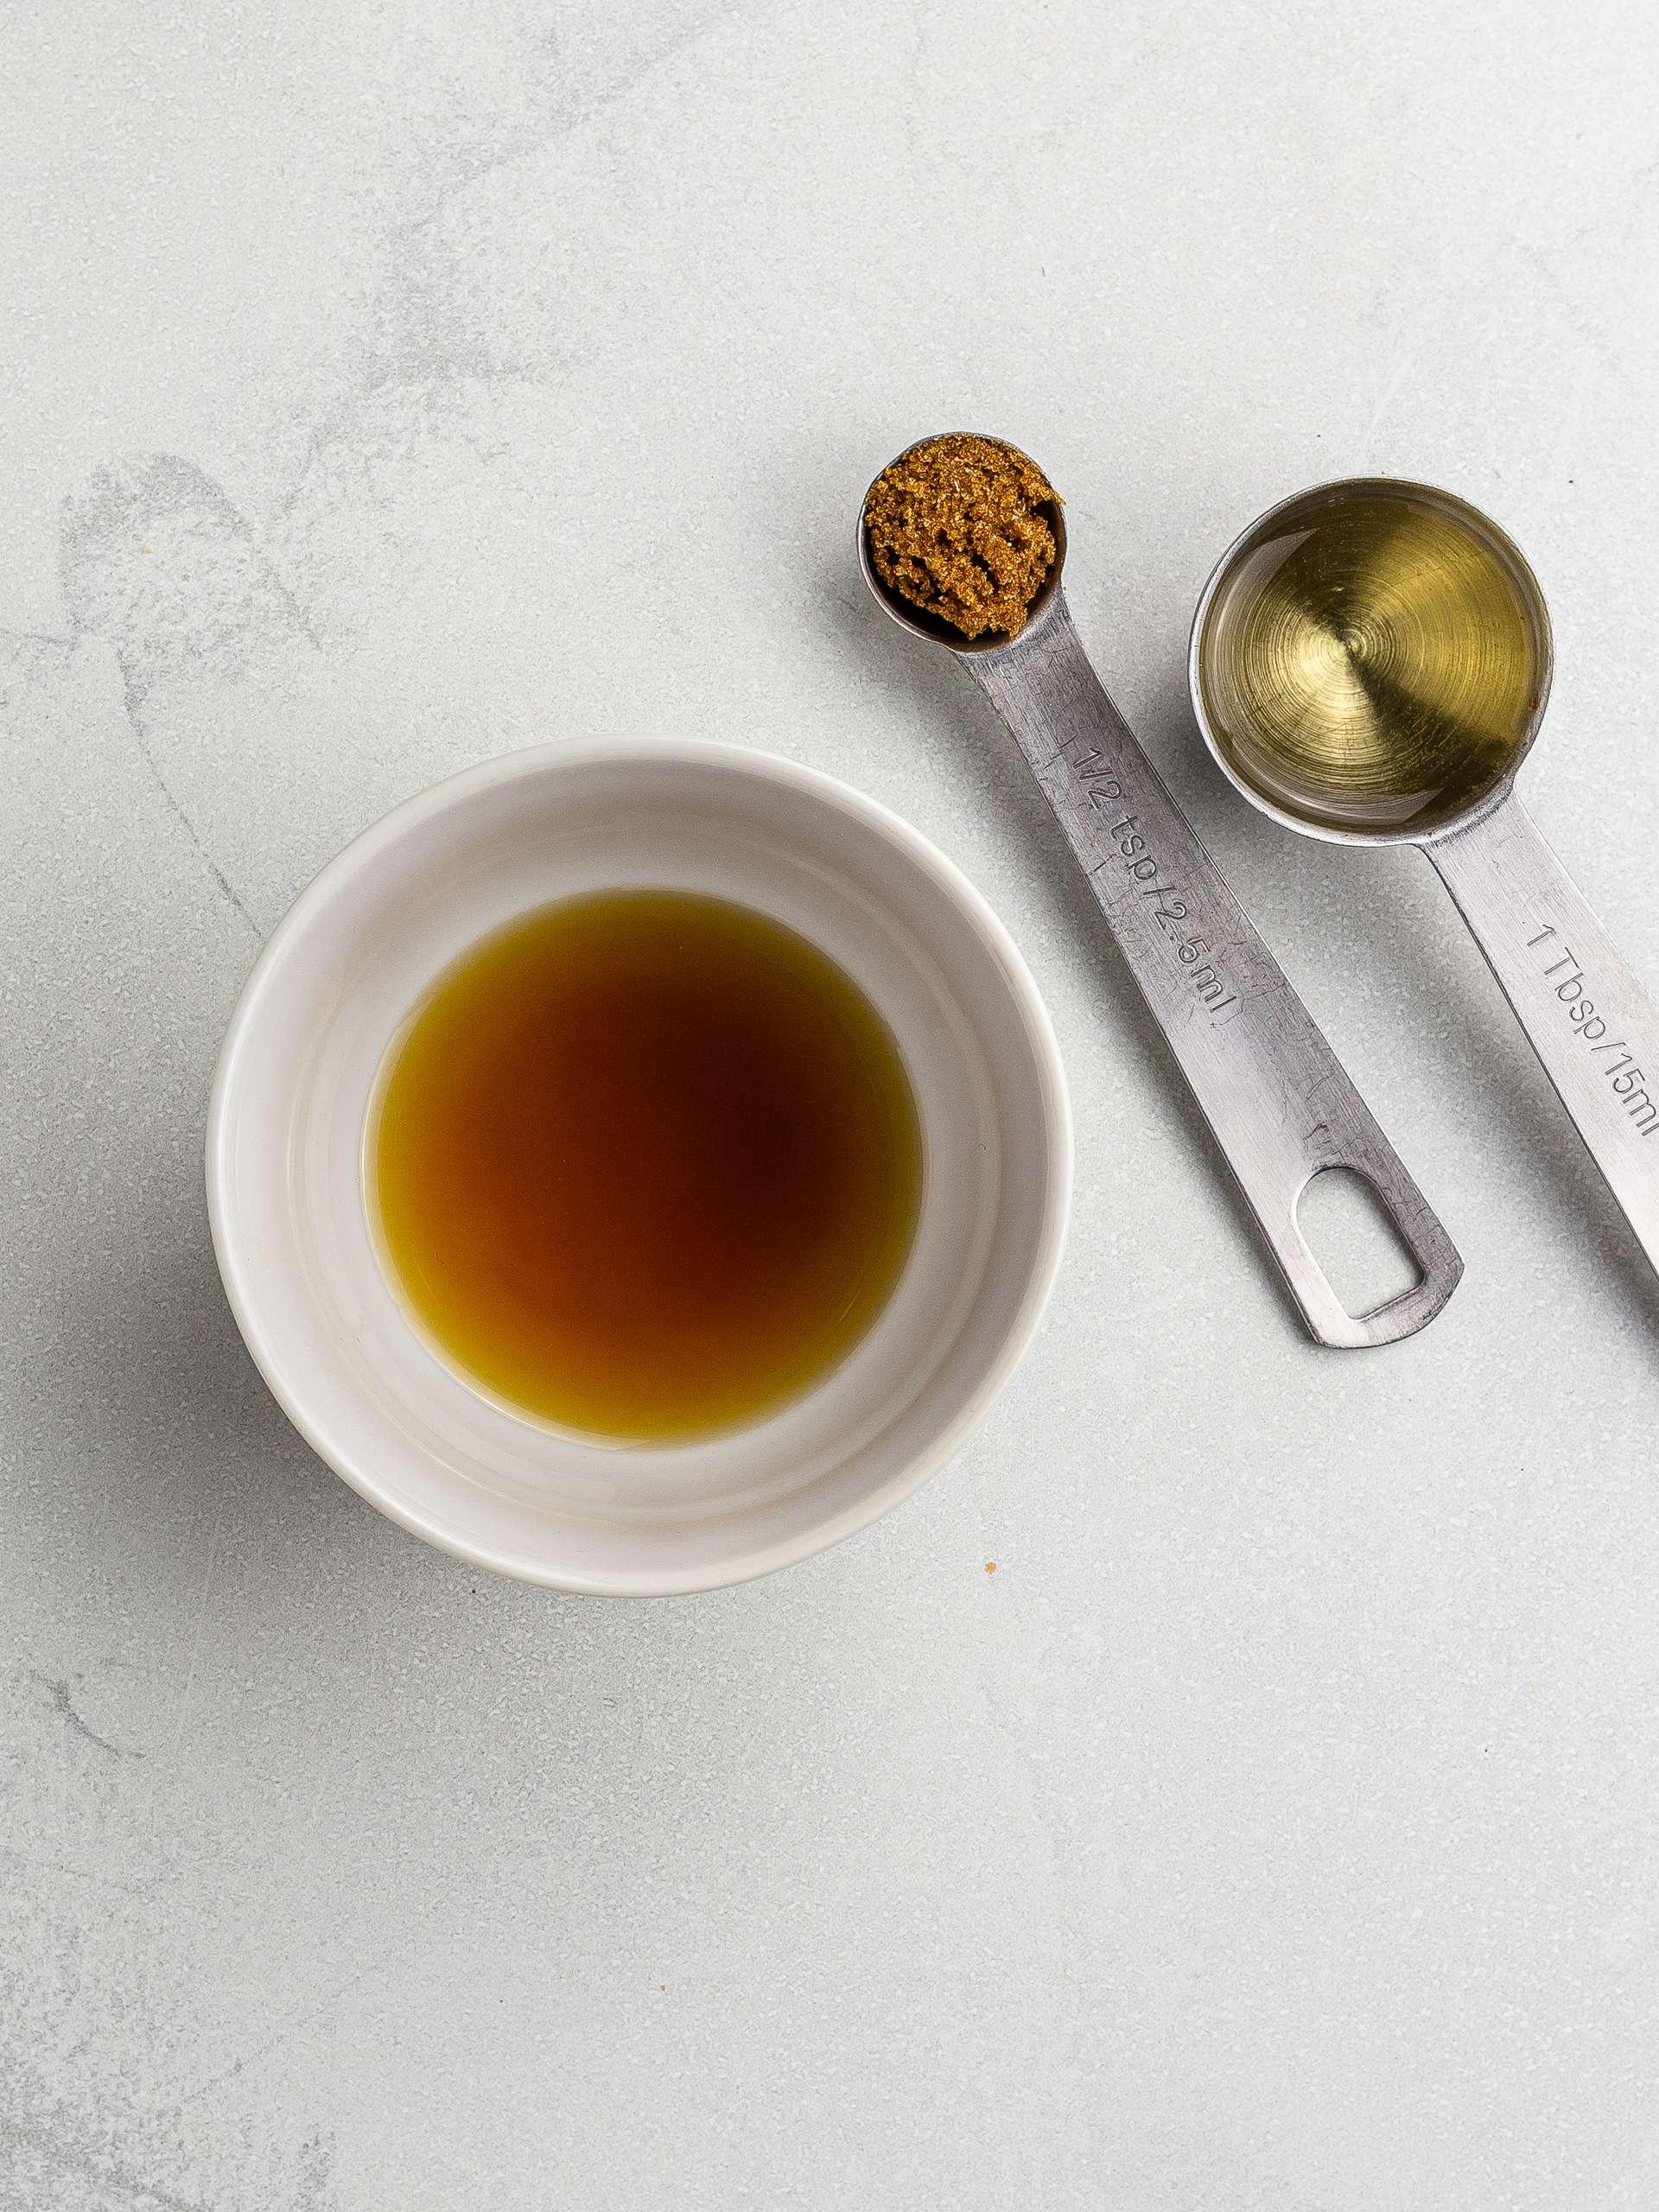 vinegar with brown sugar in a pot